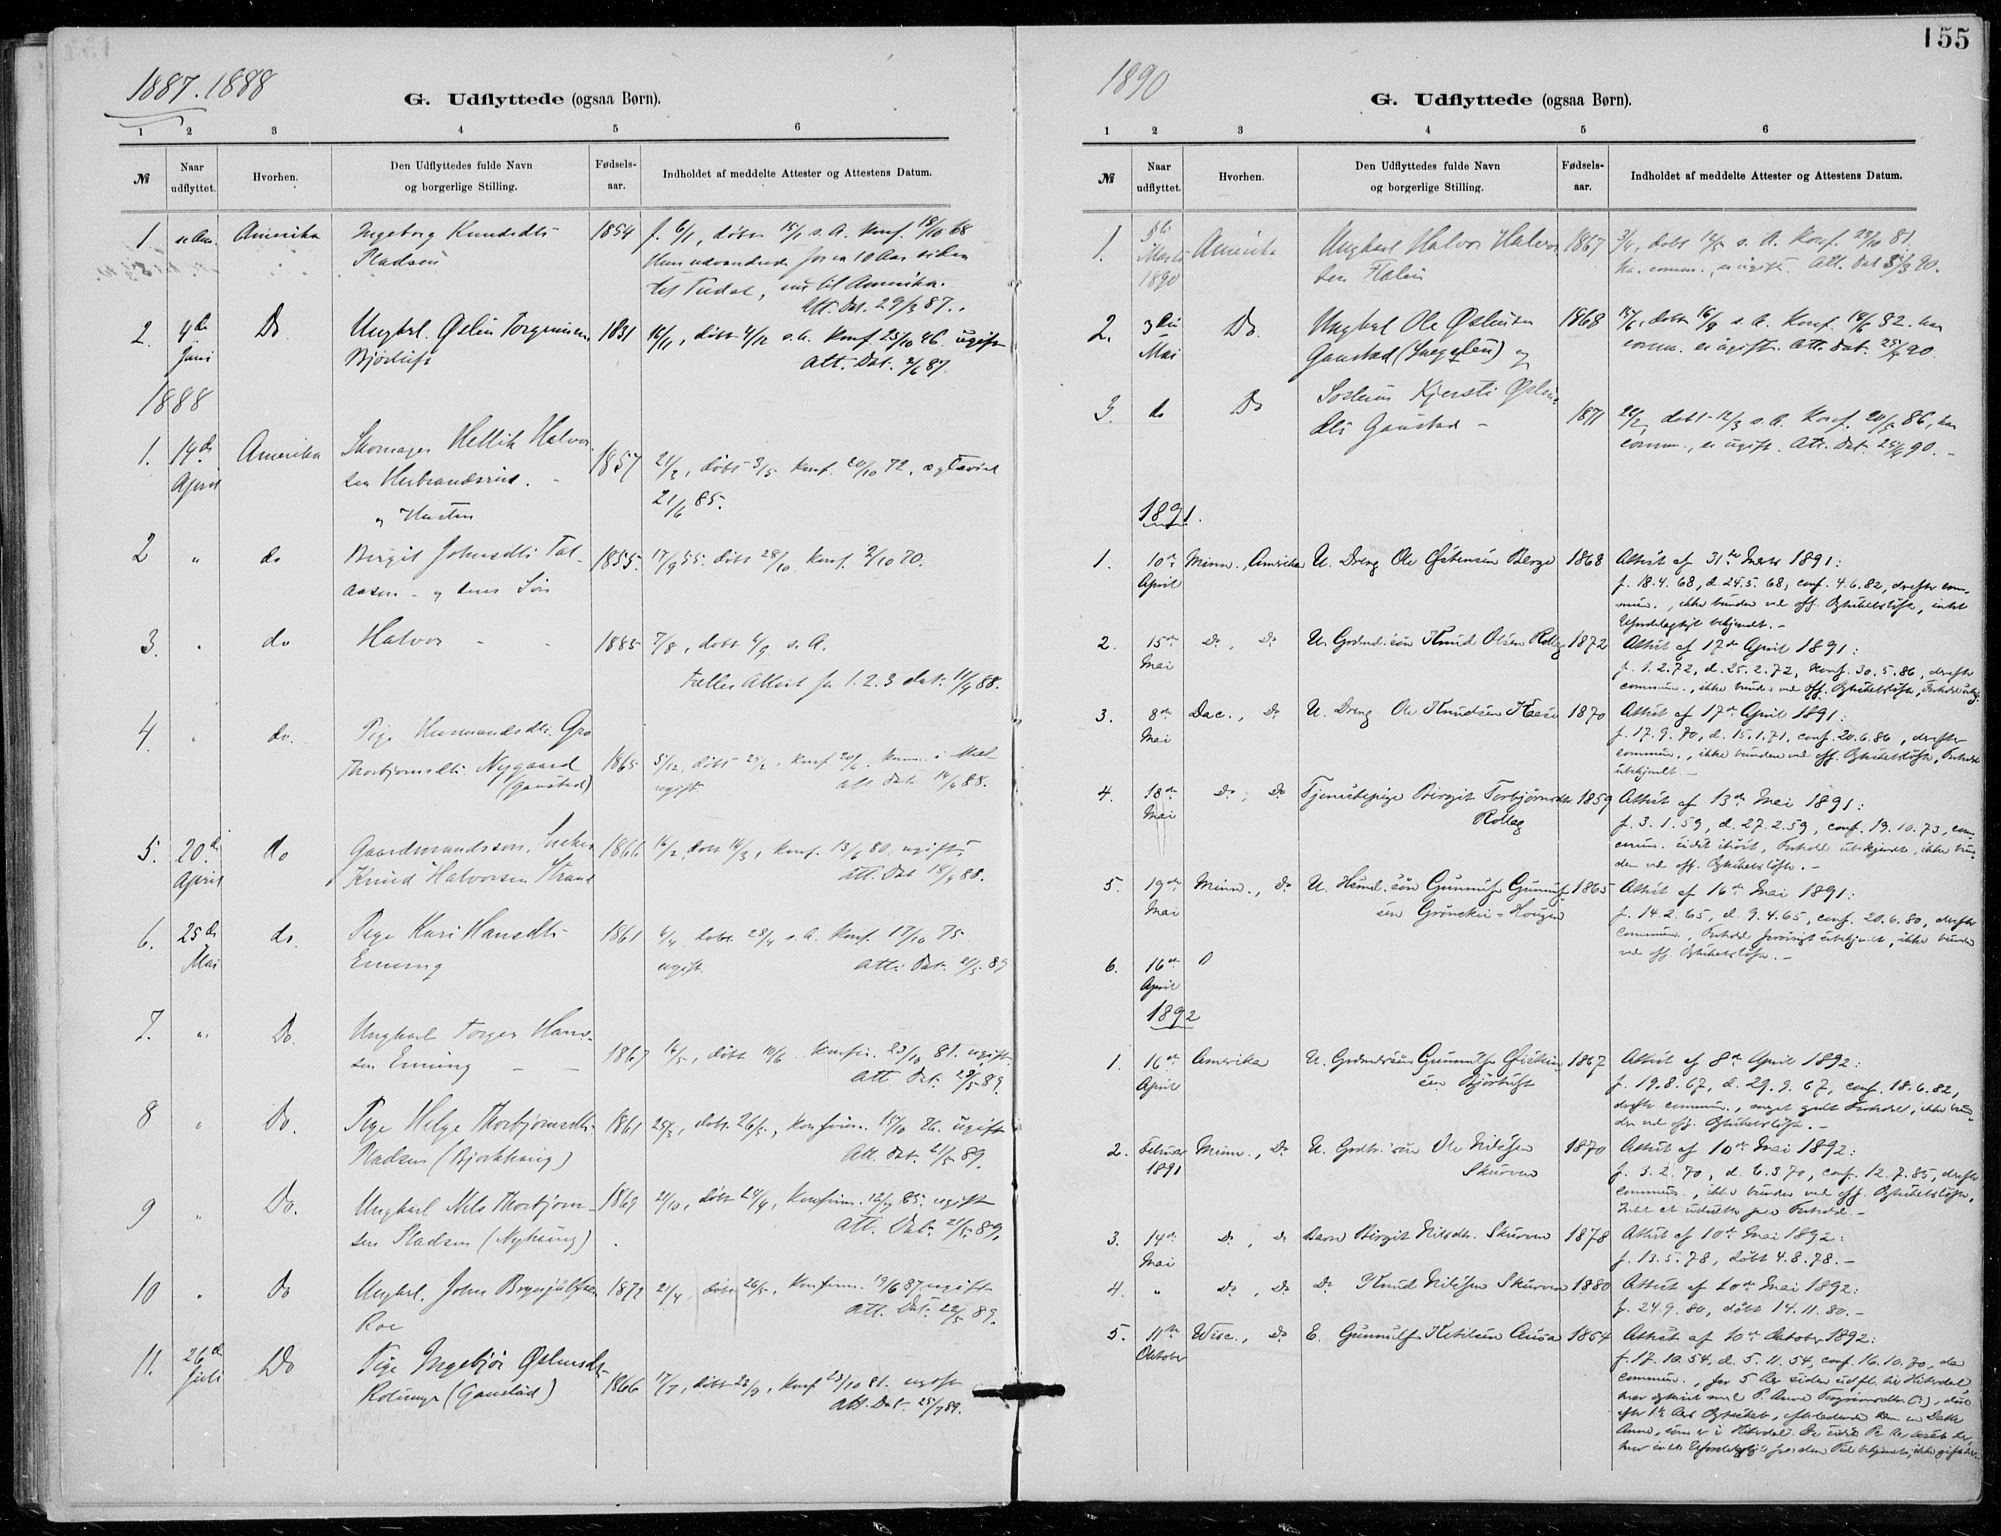 SAKO, Tinn kirkebøker, F/Fb/L0002: Ministerialbok nr. II 2, 1878-1917, s. 155